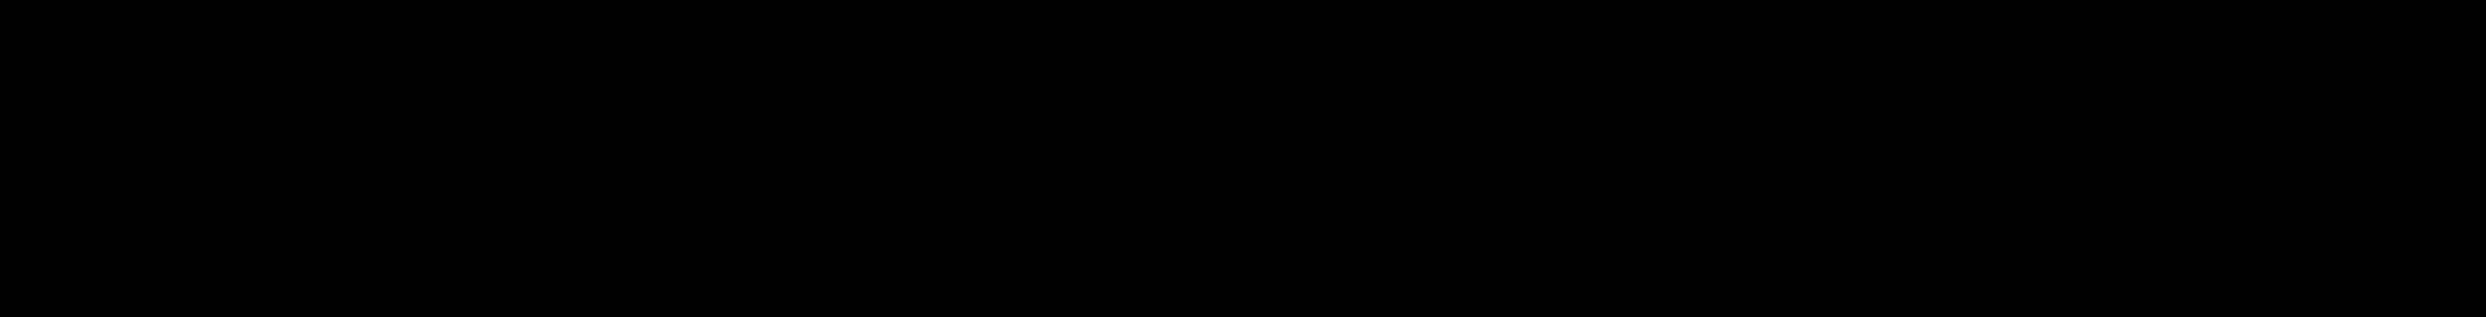 Loblaw Digital 徽标